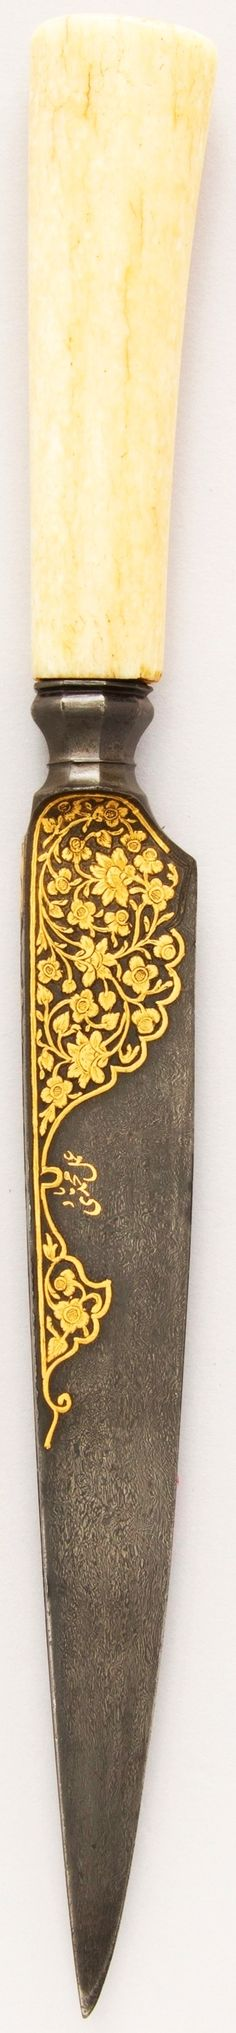 Persian kard dagger, ca. 1805-6, damascus steel blade, ivory, gold, L. 12 5/8 in. (32.1 cm); L. of blade 7 3/4 in. (19.7 cm); W. 1 3/16 in. (3 cm); D. 7/8 in. (2.2 cm); Wt. 8.4 oz. (238.1 g), Met Museum.